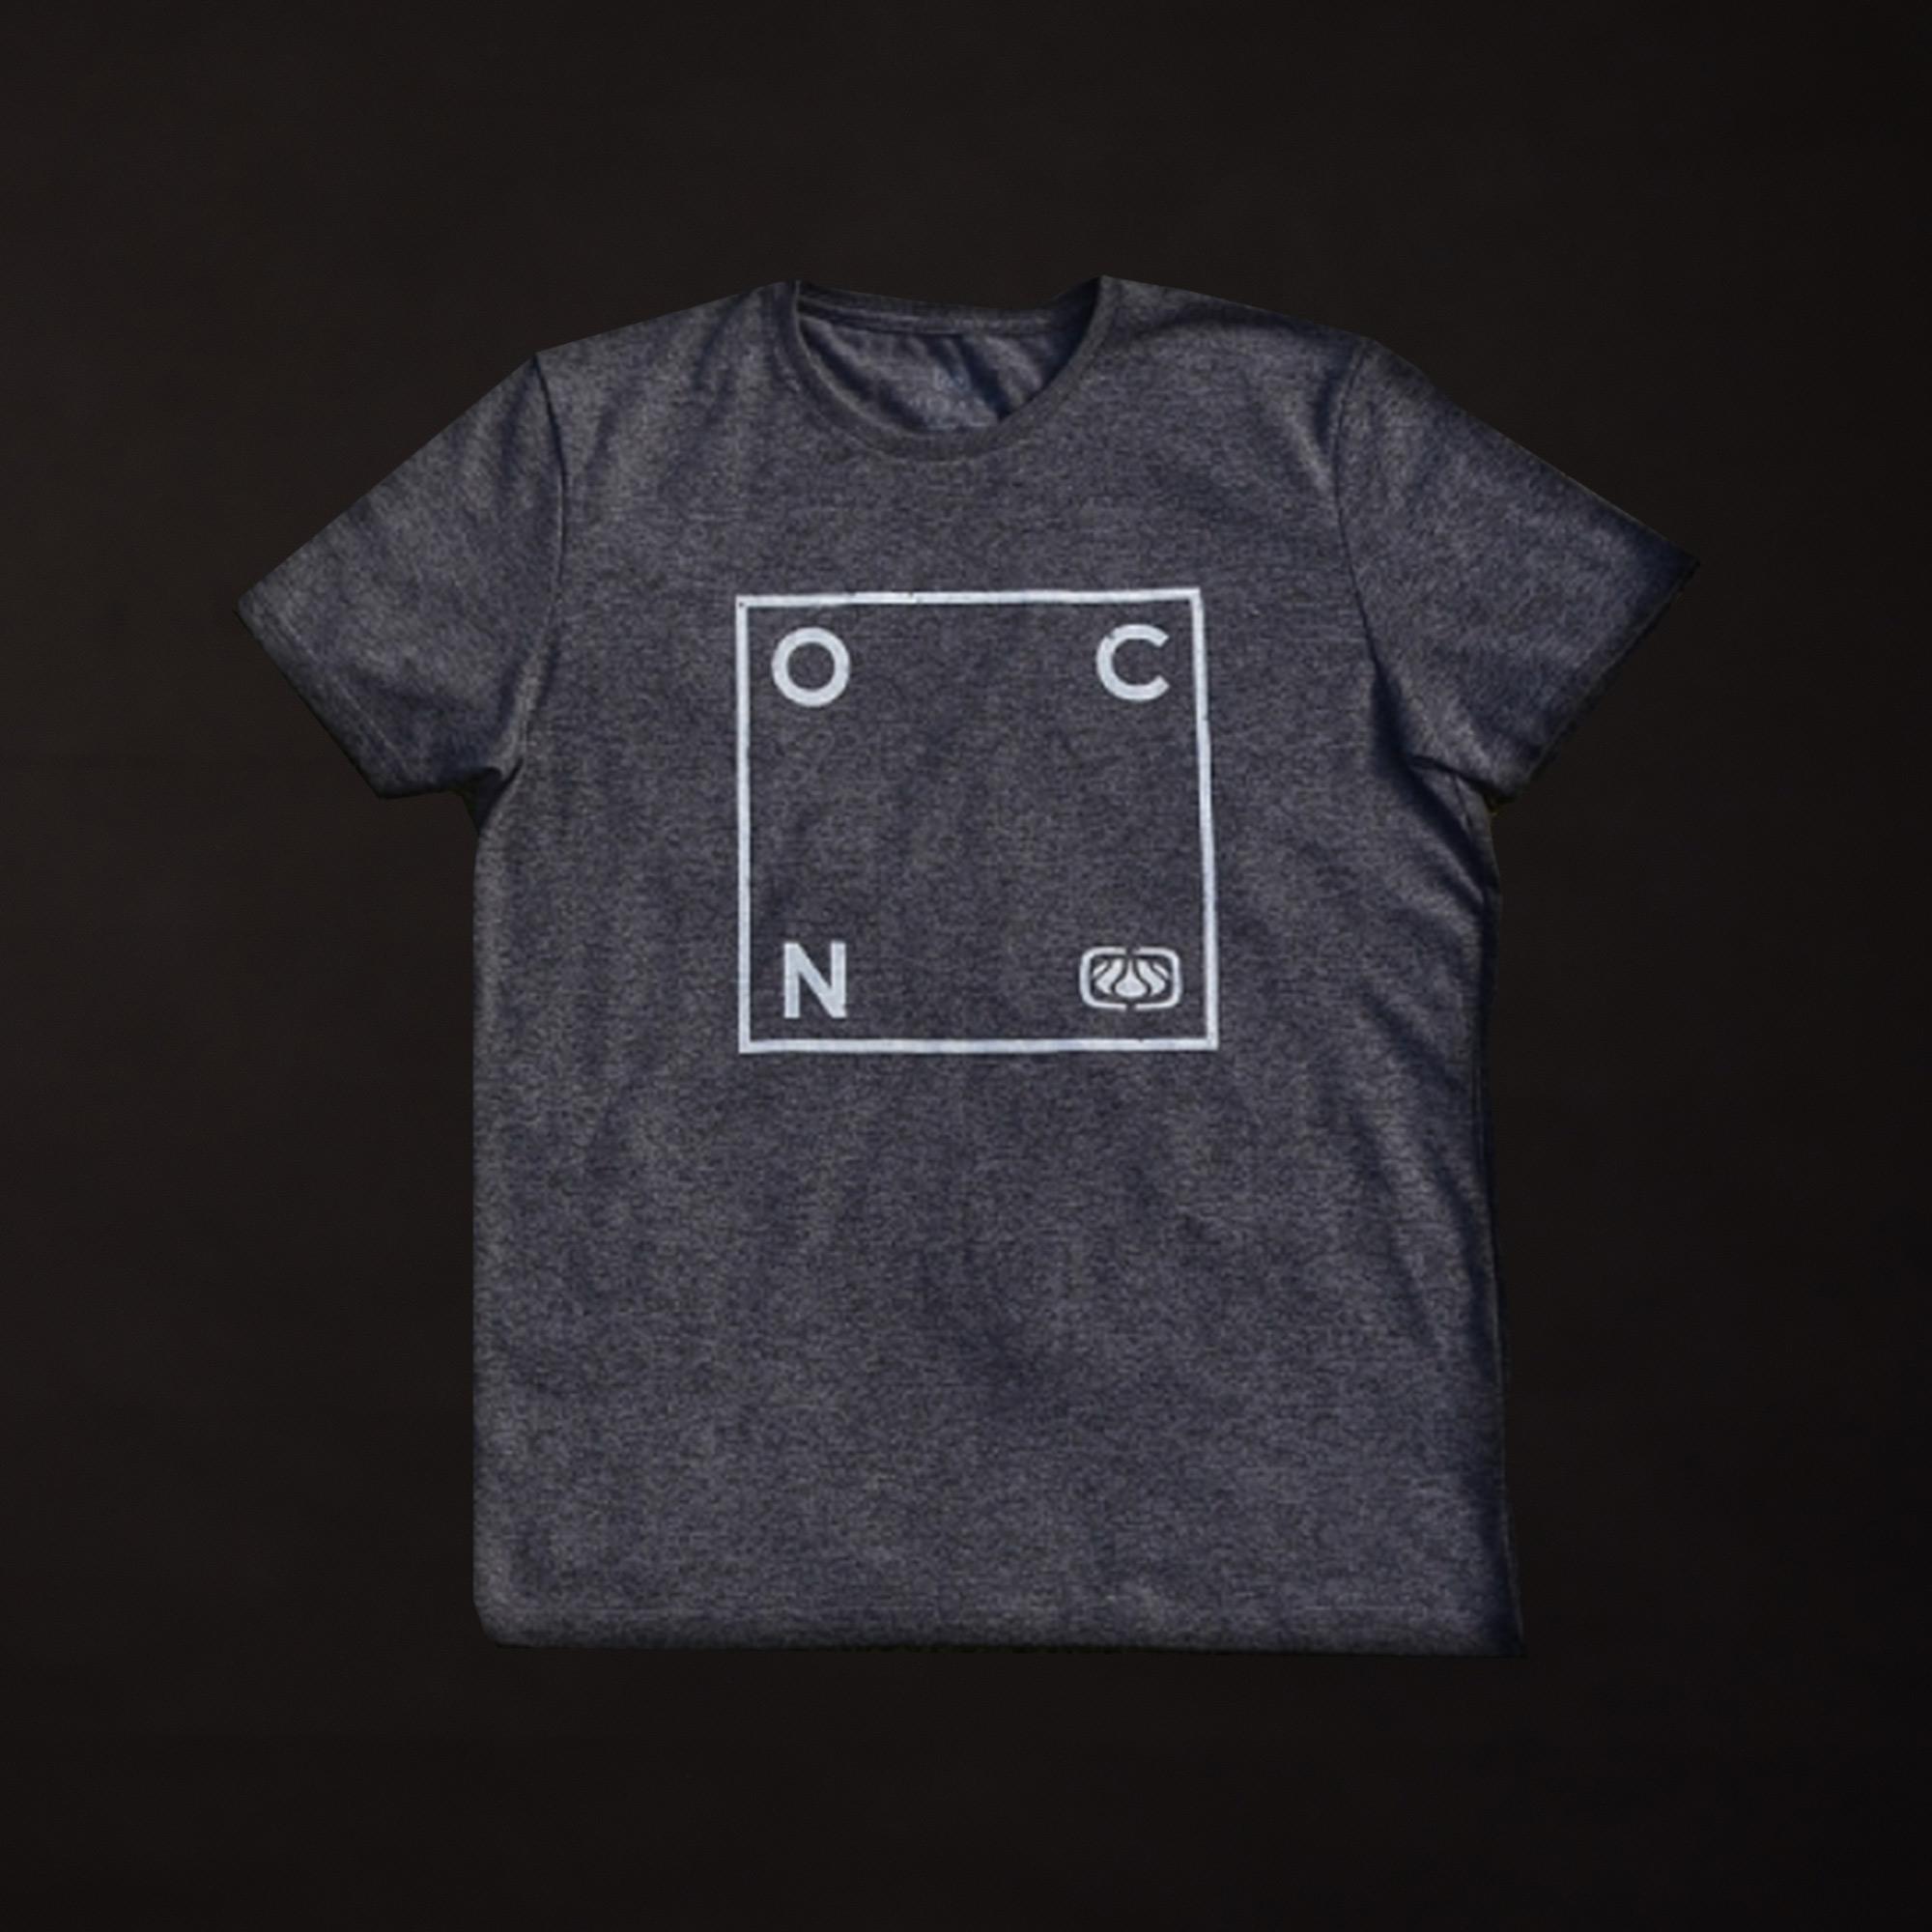 Camiseta Oceano